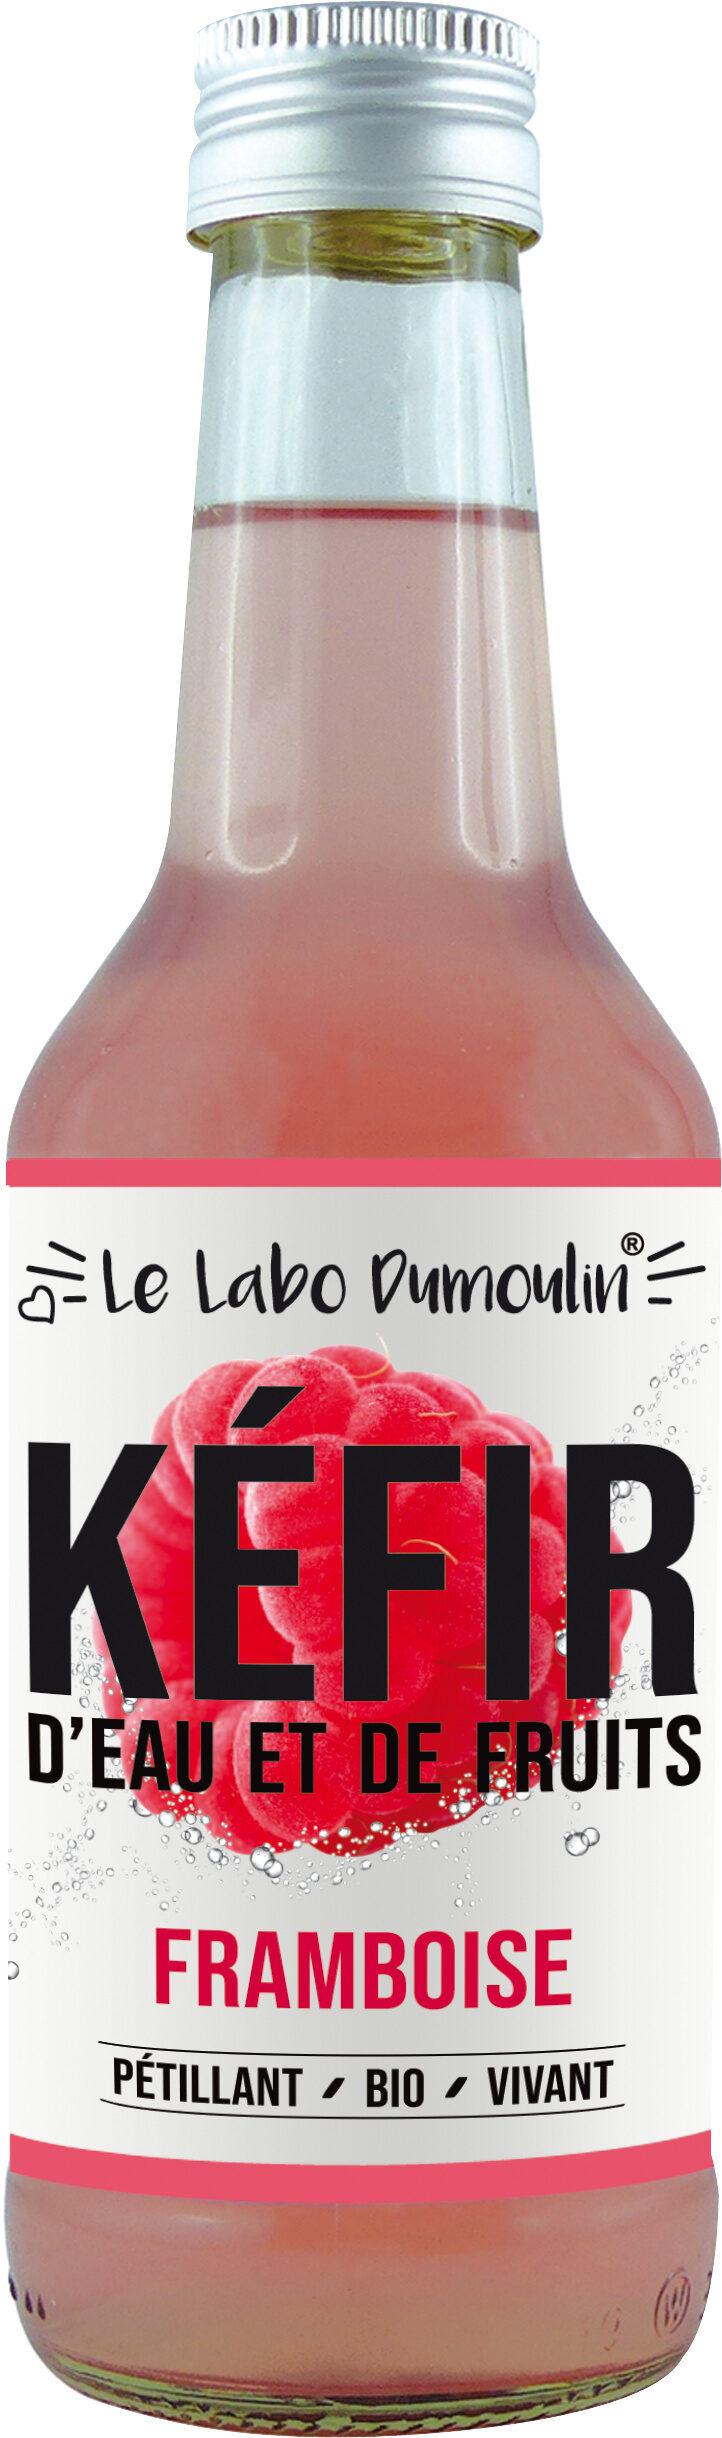 Kéfir de fruits framboise bio - Produit - fr